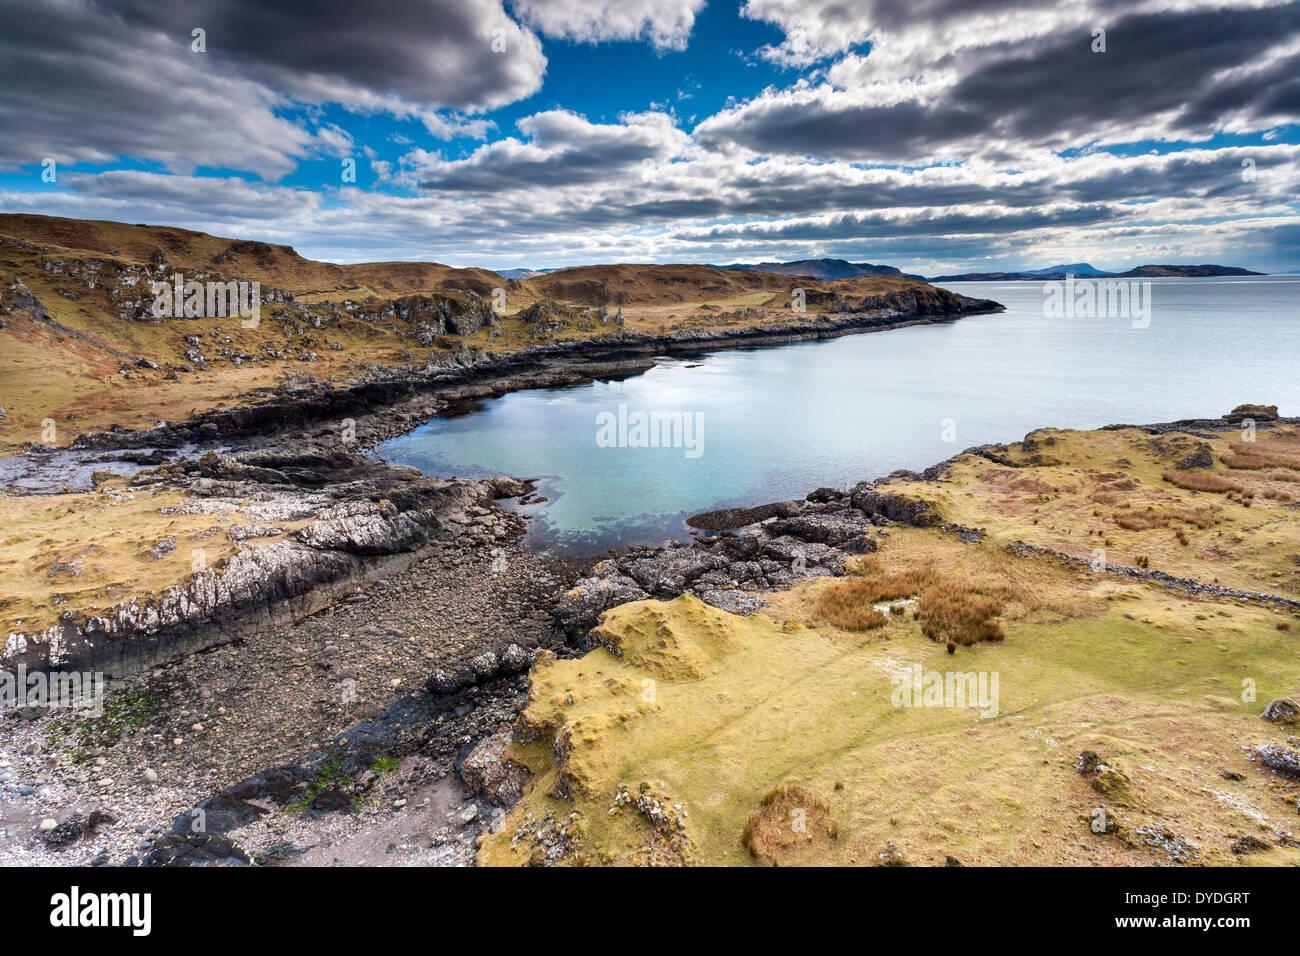 A view over Port a Chroinn on the Kerrera Island. - Stock Image